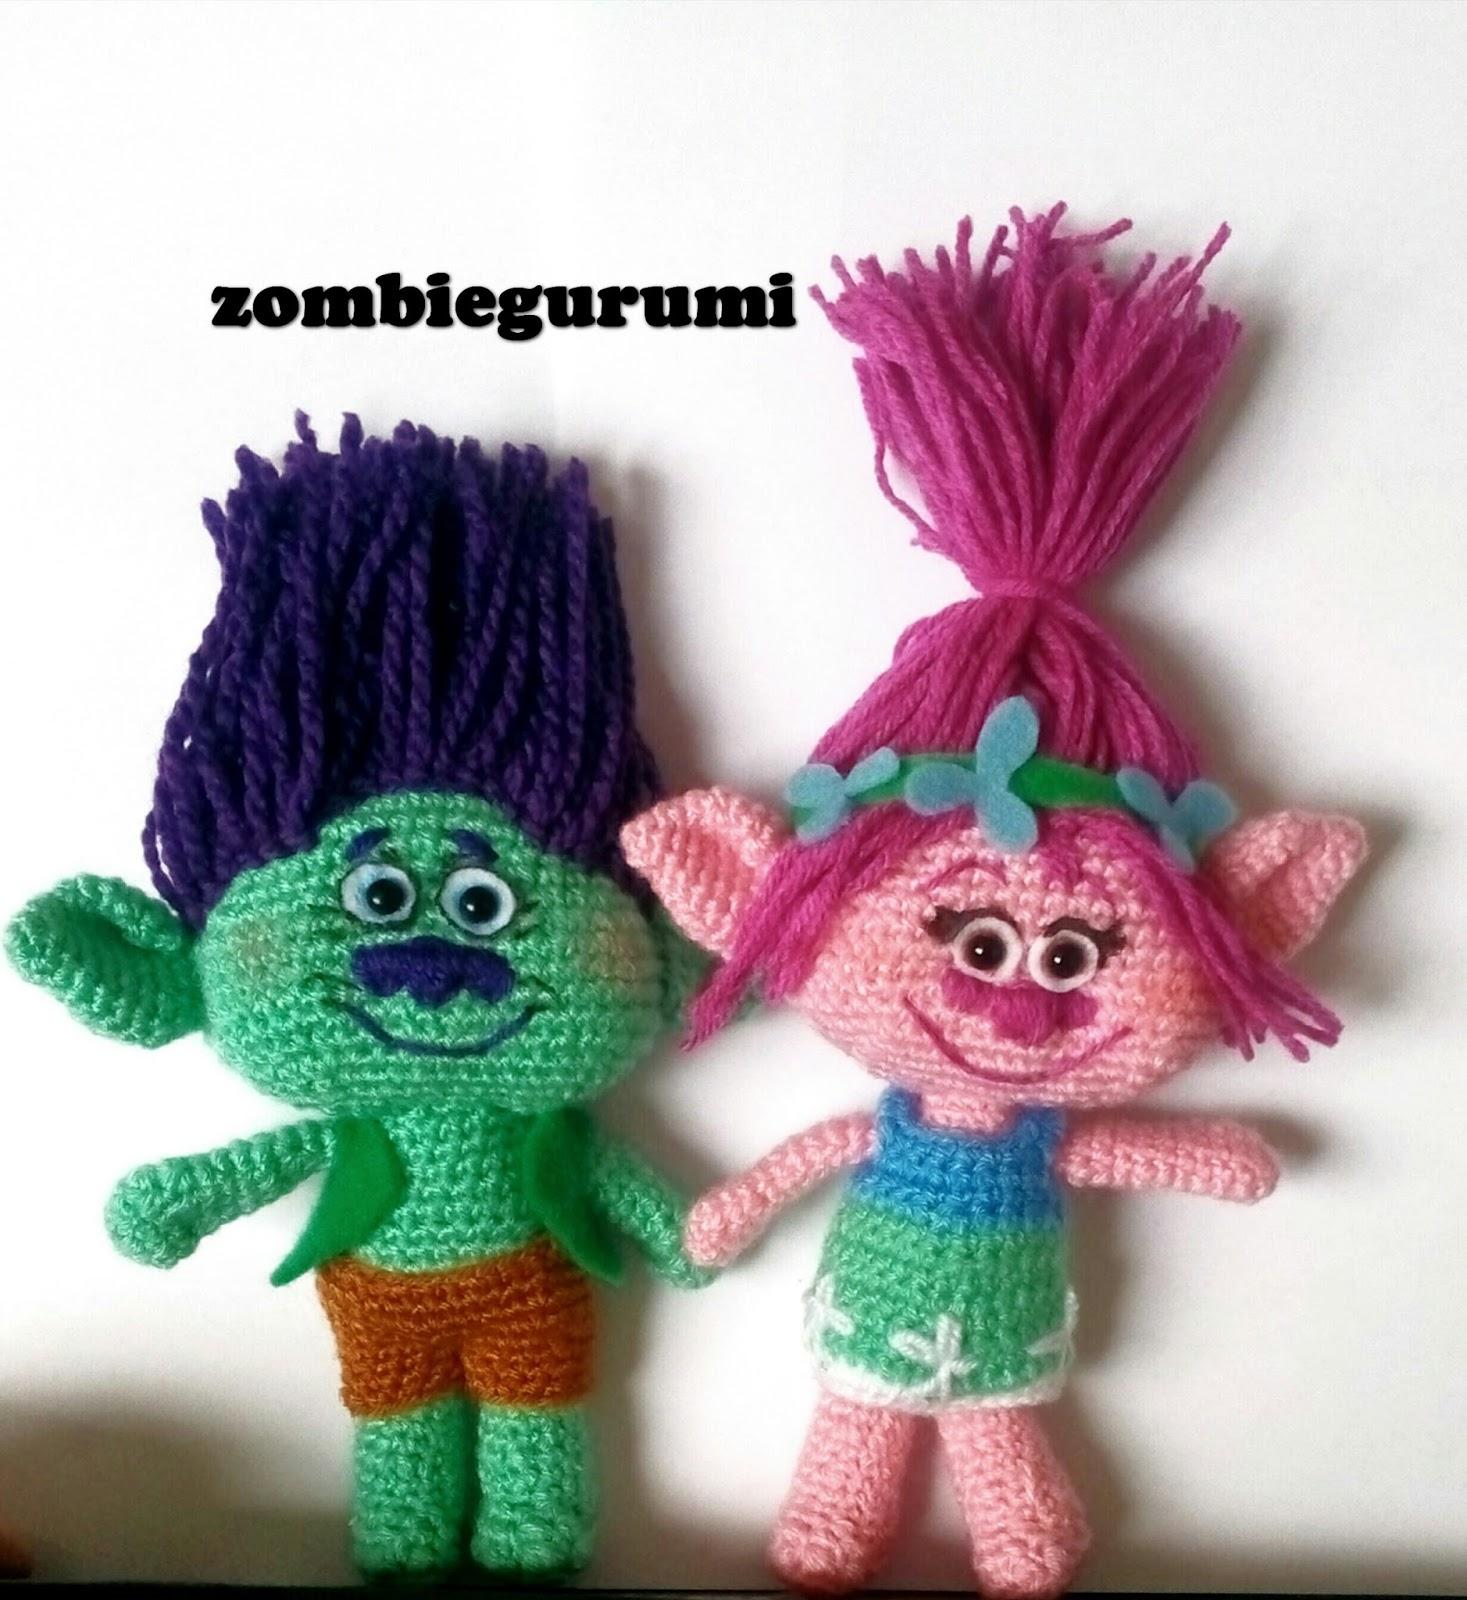 Trolls Knitting Or Crocheting Patterns : Amigurumis poppy amigurumi trolls la pelicula